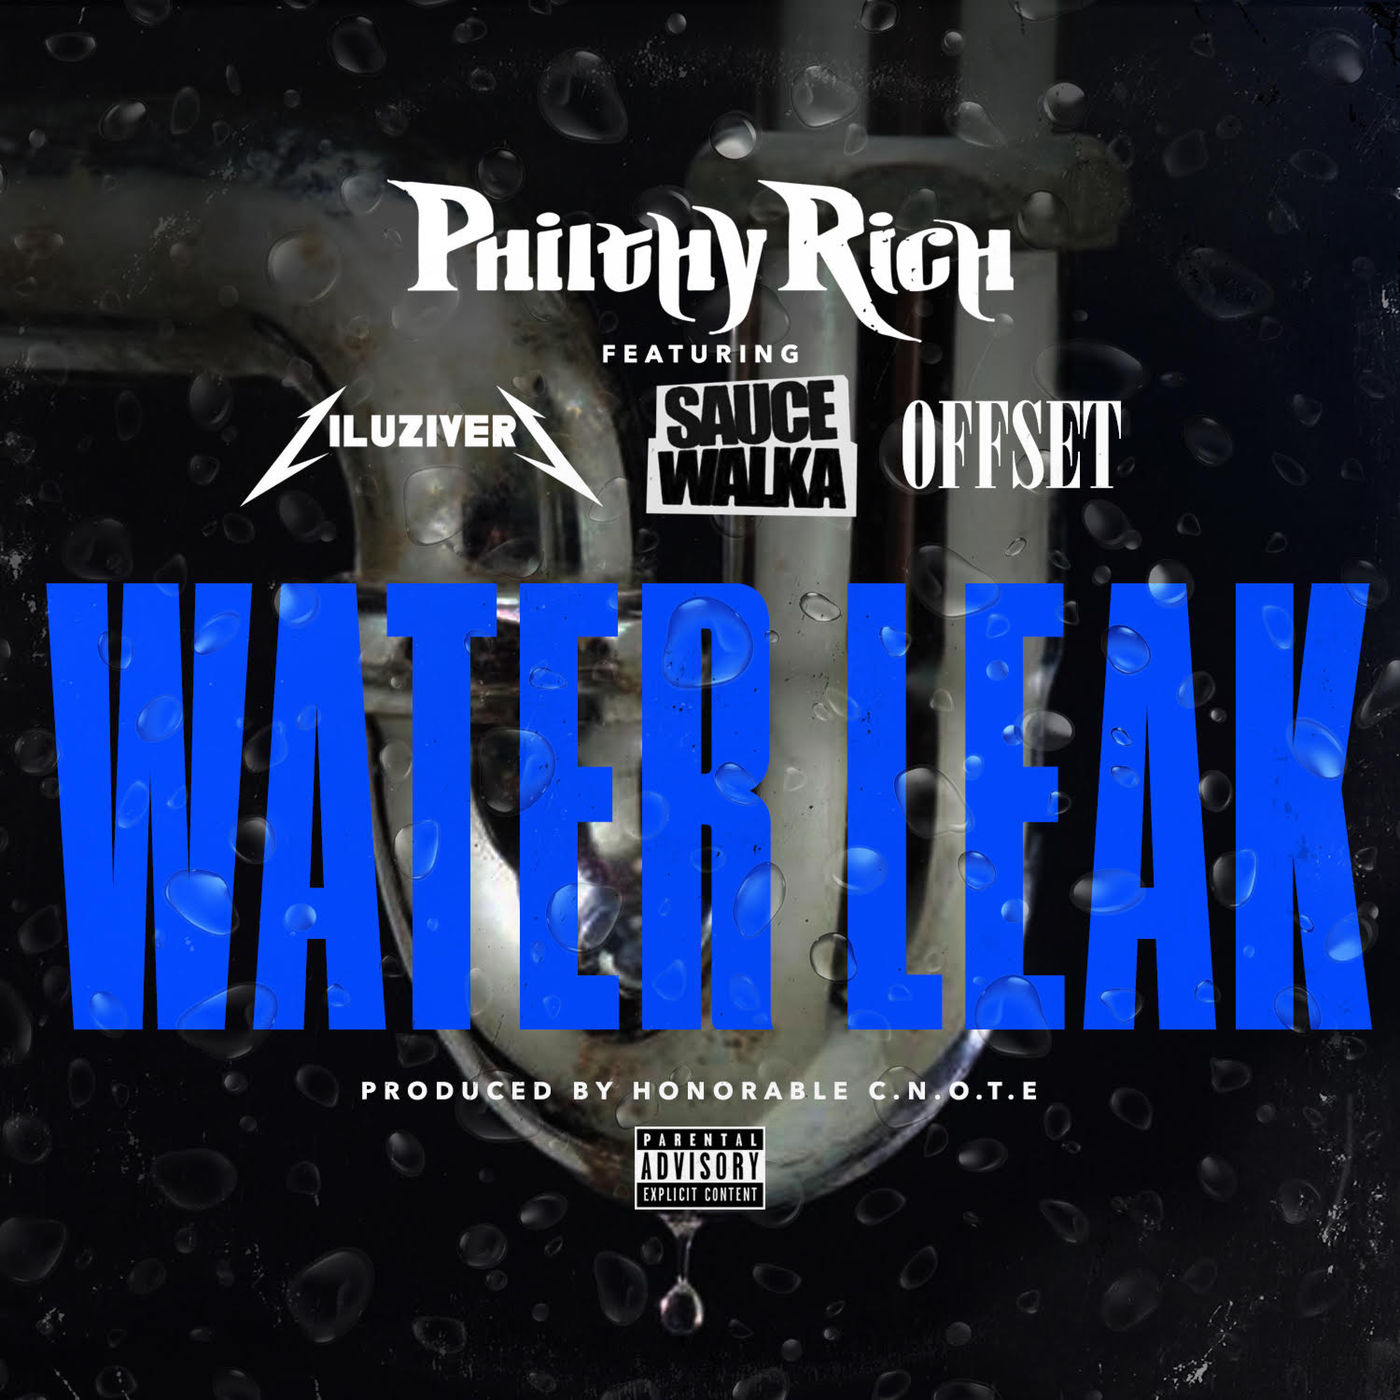 Philthy Rich - Water Leak (feat. Lil Uzi Vert, Sauce Walka & Off Set) - Single Cover